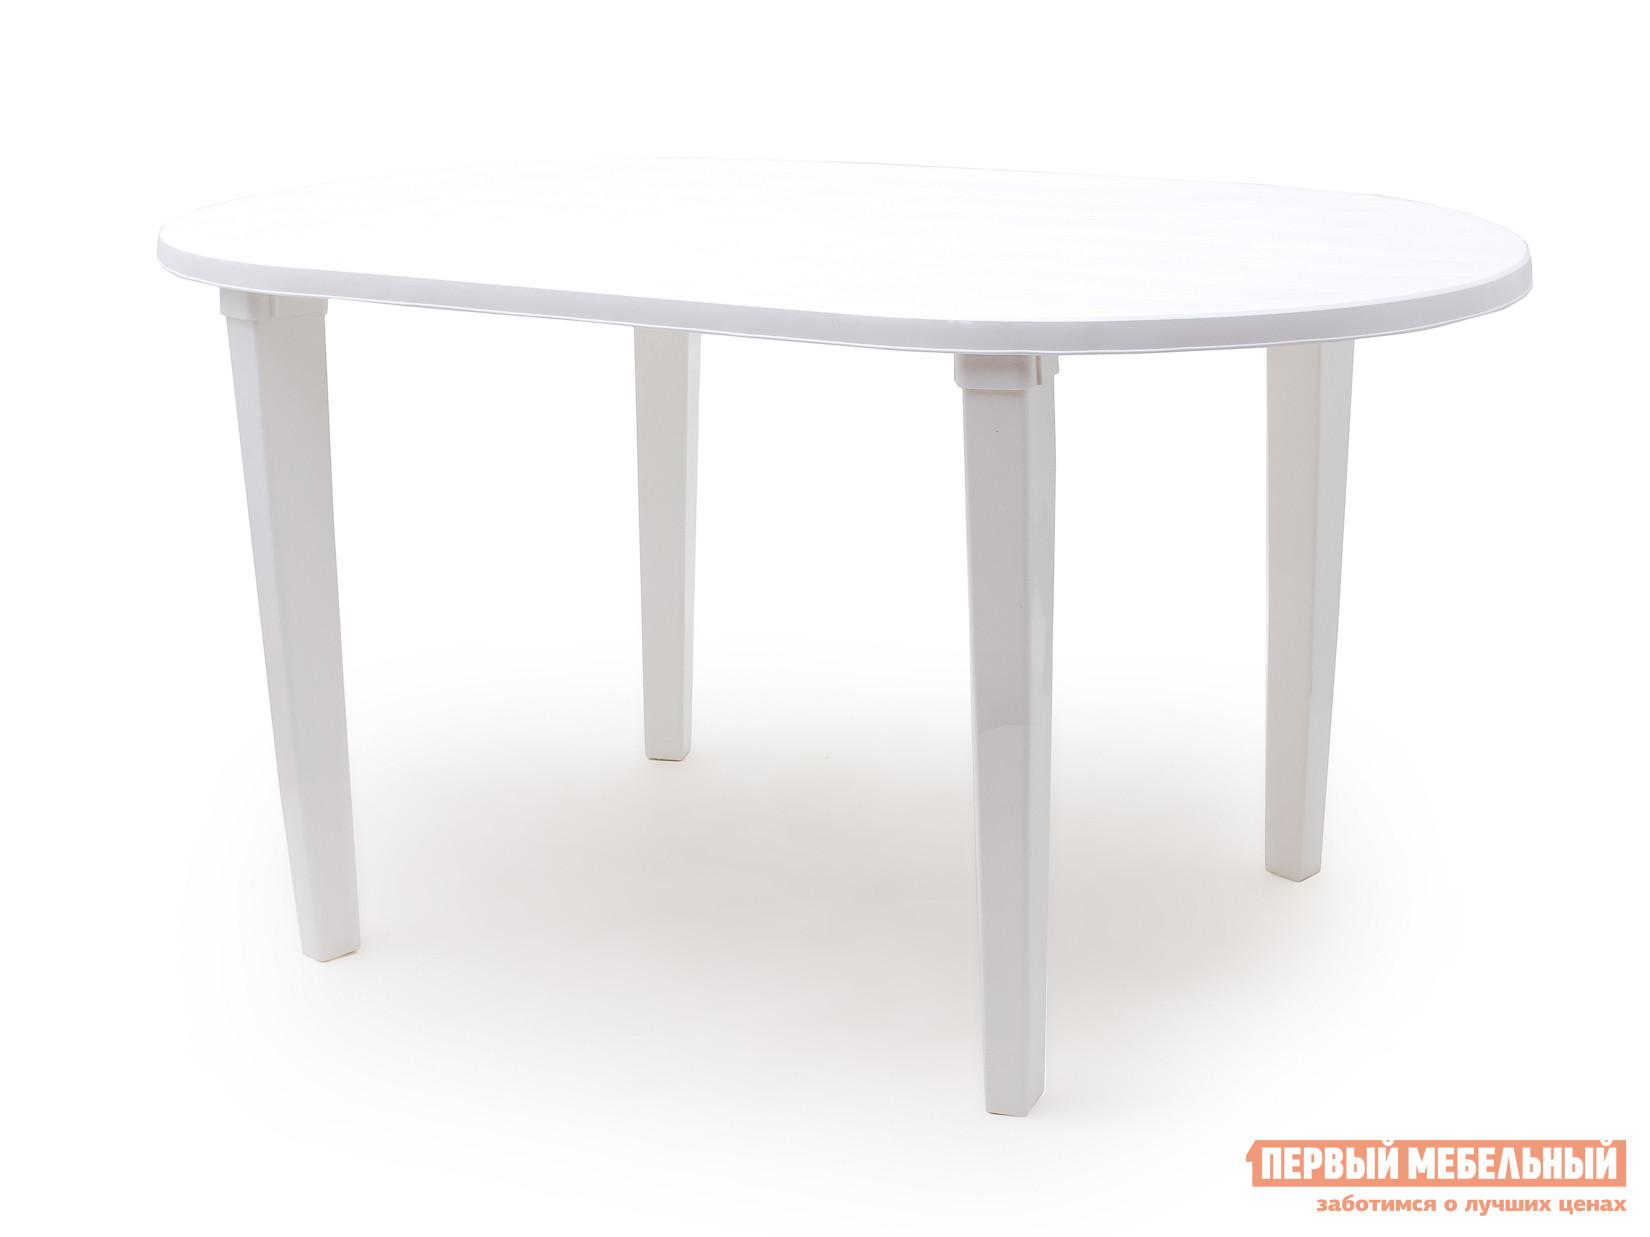 Пластиковый стол Стандарт Пластик Групп Стол овальный (1400х800х710) мм